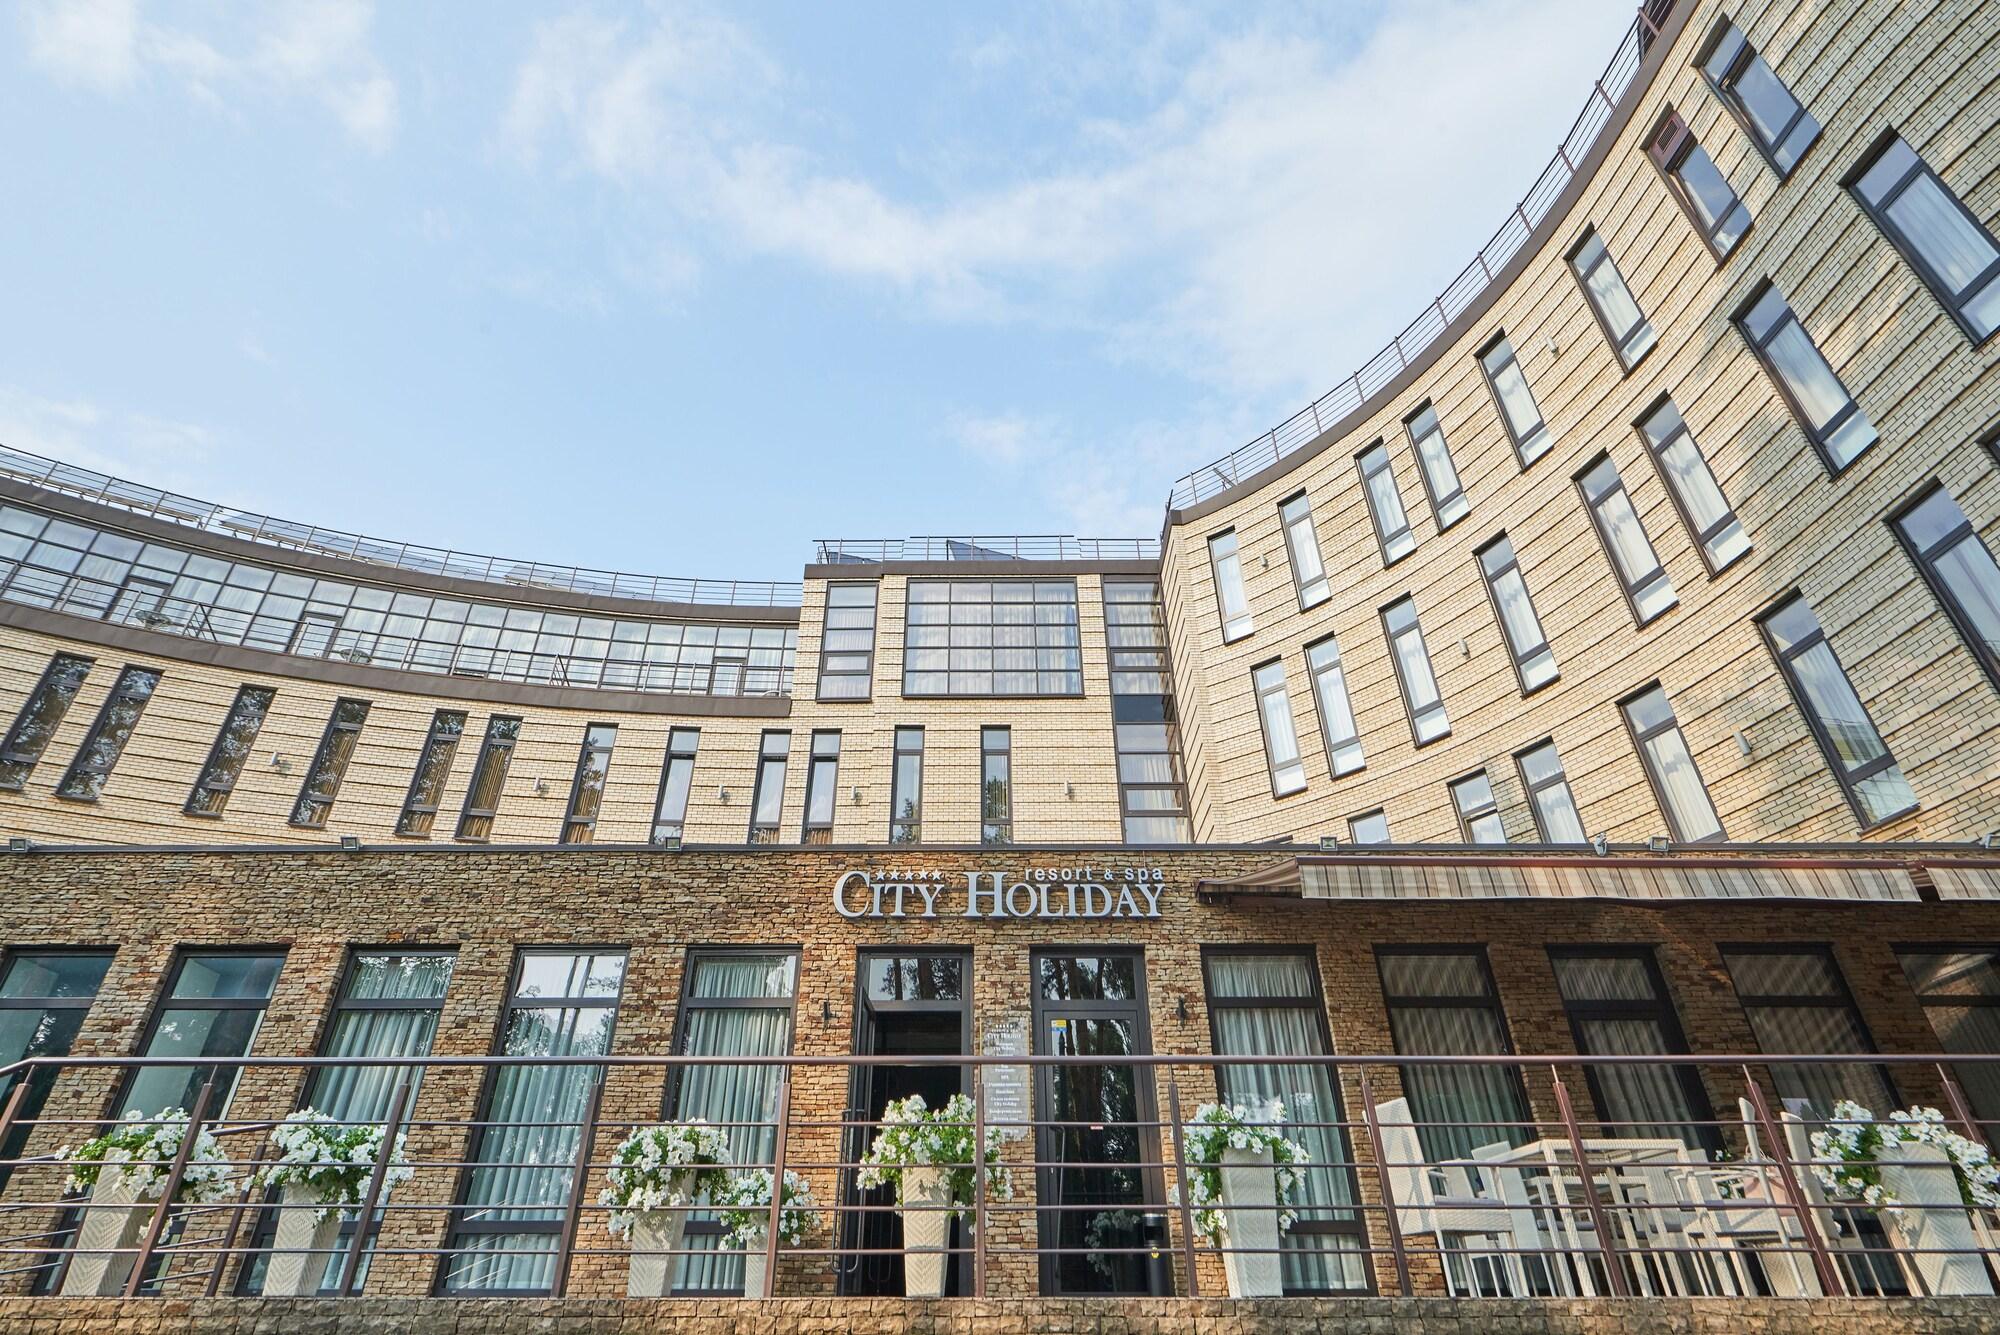 City Holiday Resort & SPA, Kyievo-Sviatoshyns'kyi